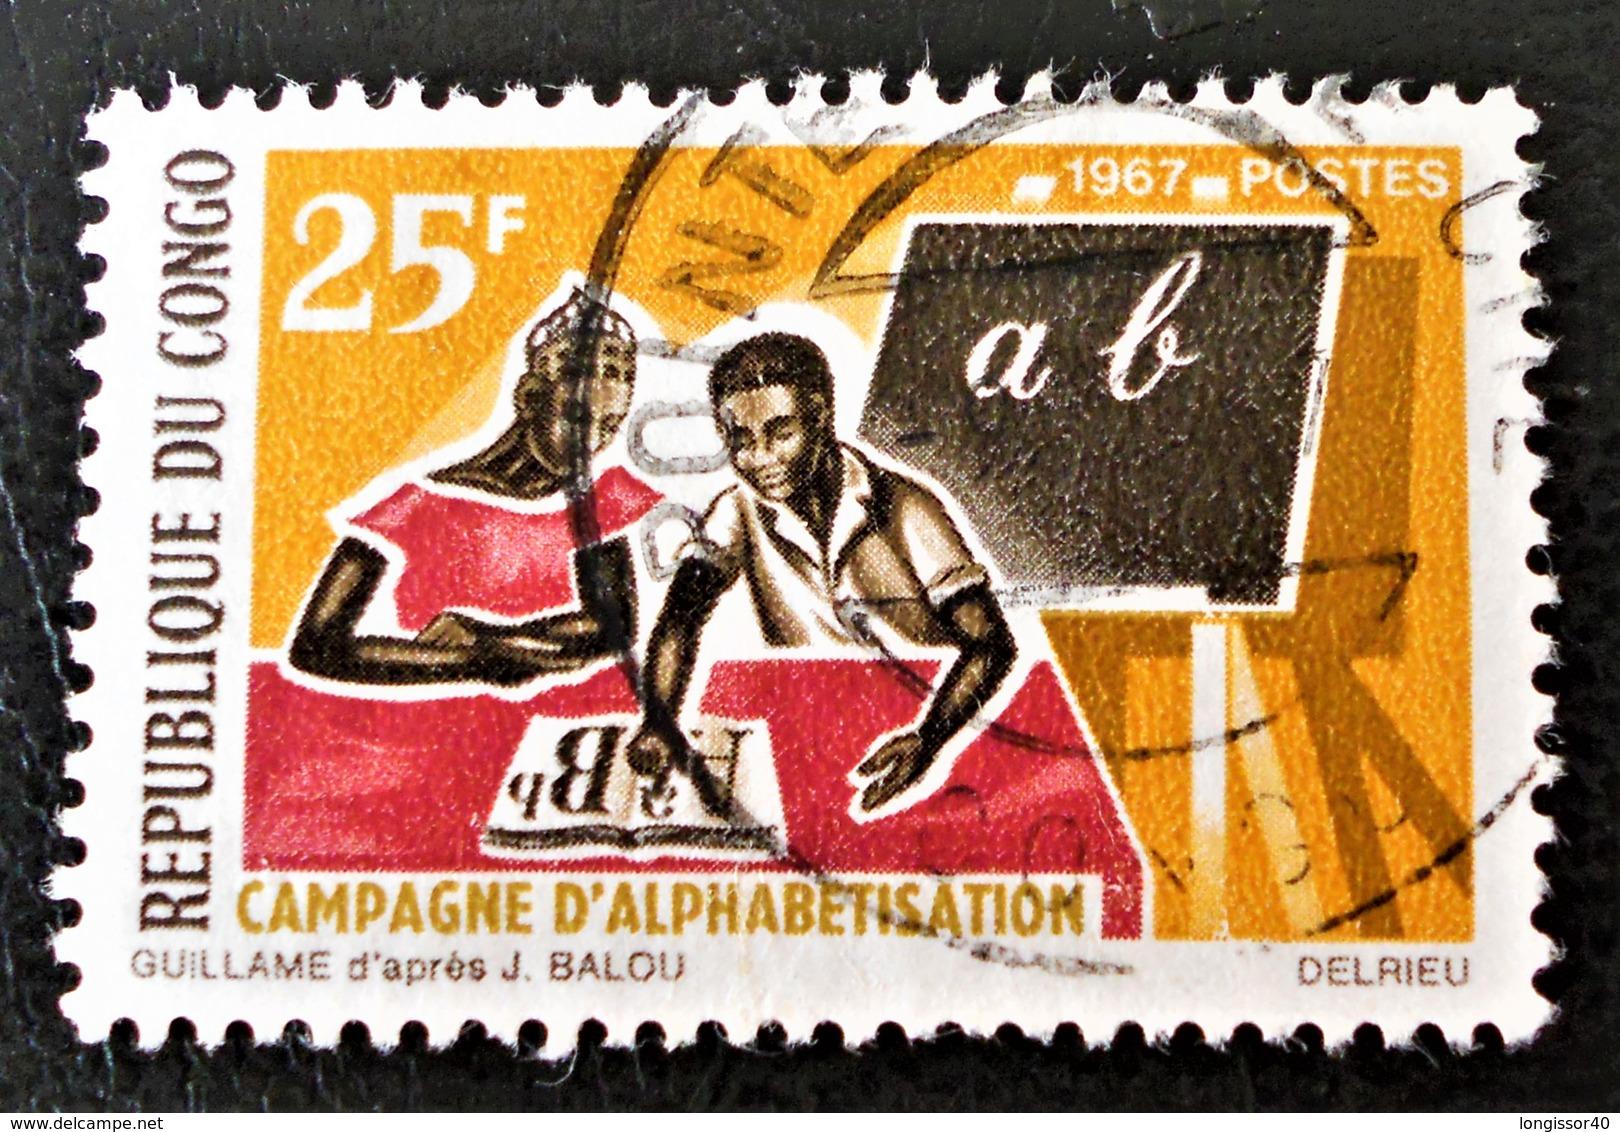 CAMPAGNE D'ALPHABETISATION 1967 - OBLITERE - YT 204 - MI 124 - Congo - Brazzaville